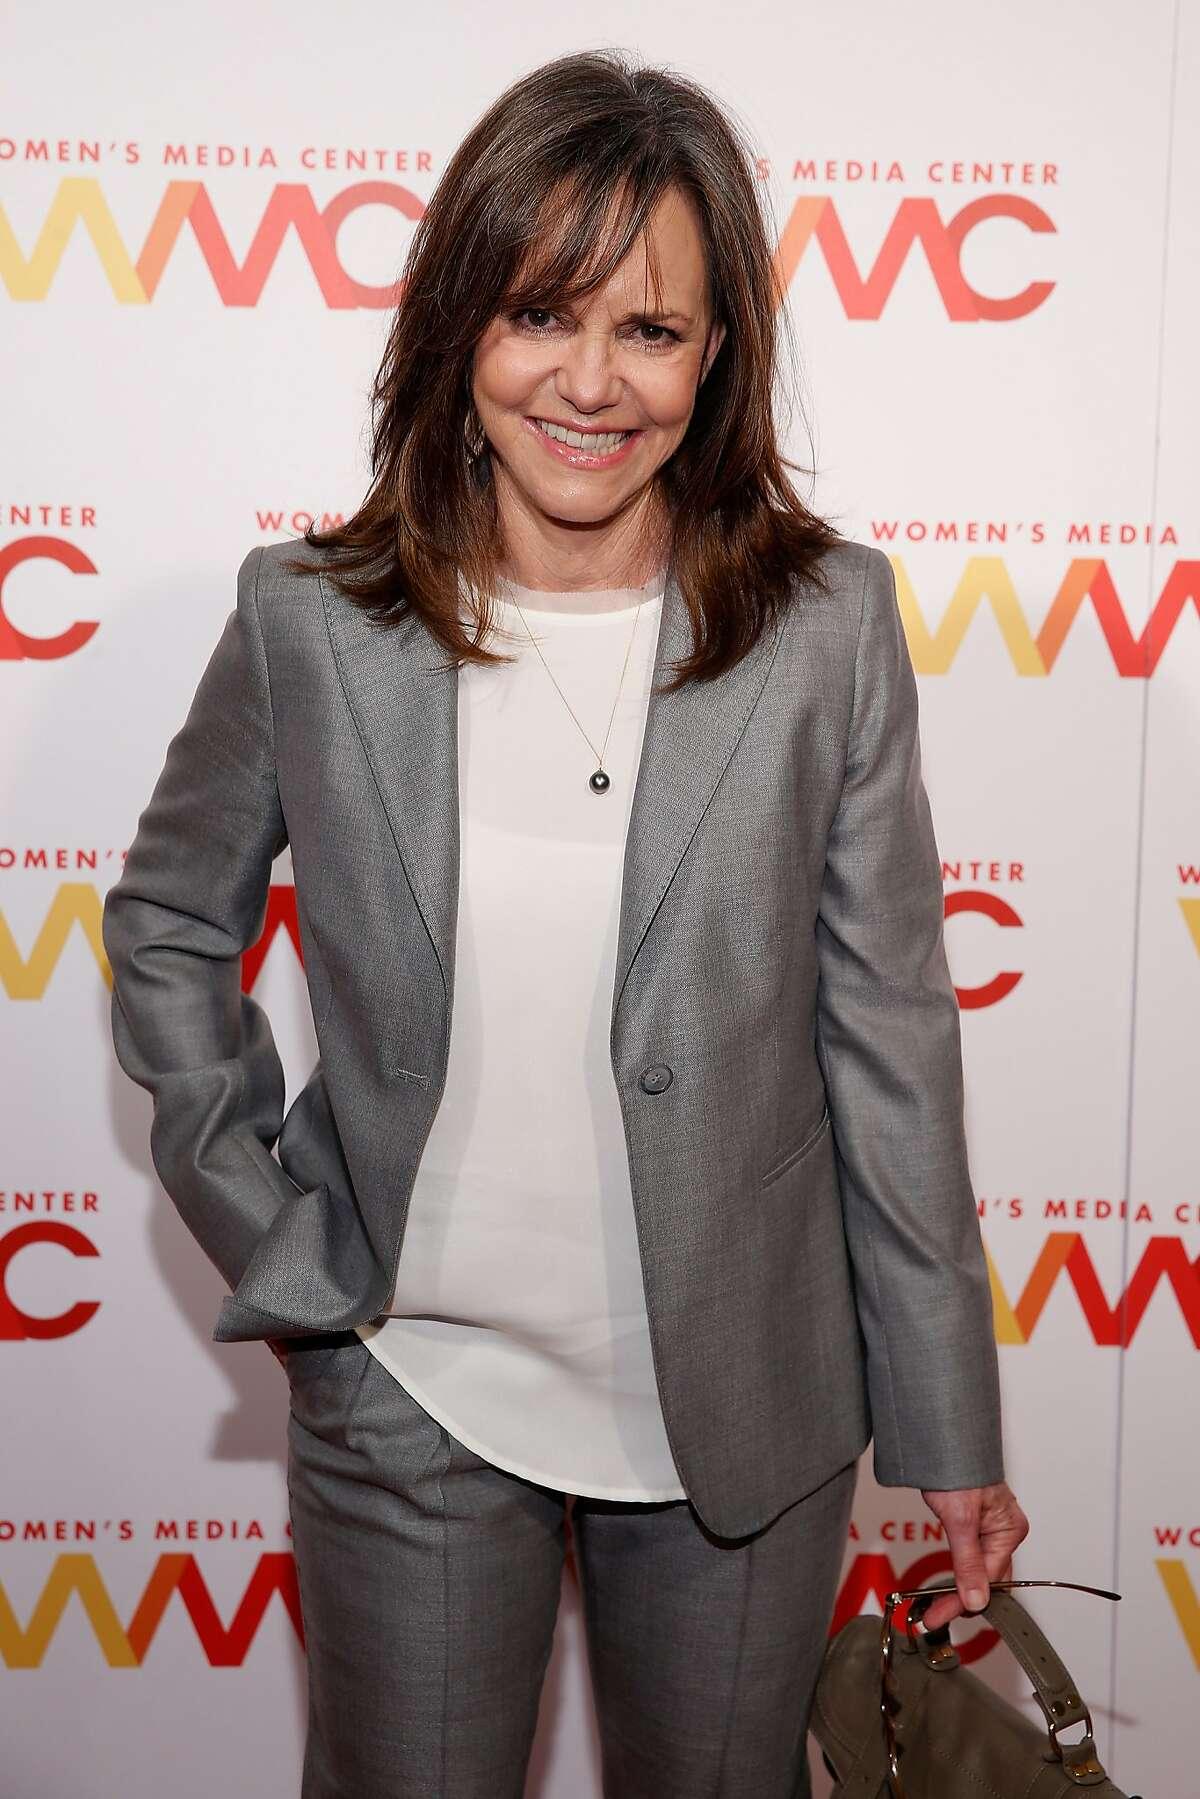 NEW YORK, NY - NOVEMBER 05: Actress Sally Field attends The Women's Media Center 2015 Women's Media Awards on November 5, 2015 in New York City. (Photo by Brian Ach/Getty Images for The Women's Media Center)